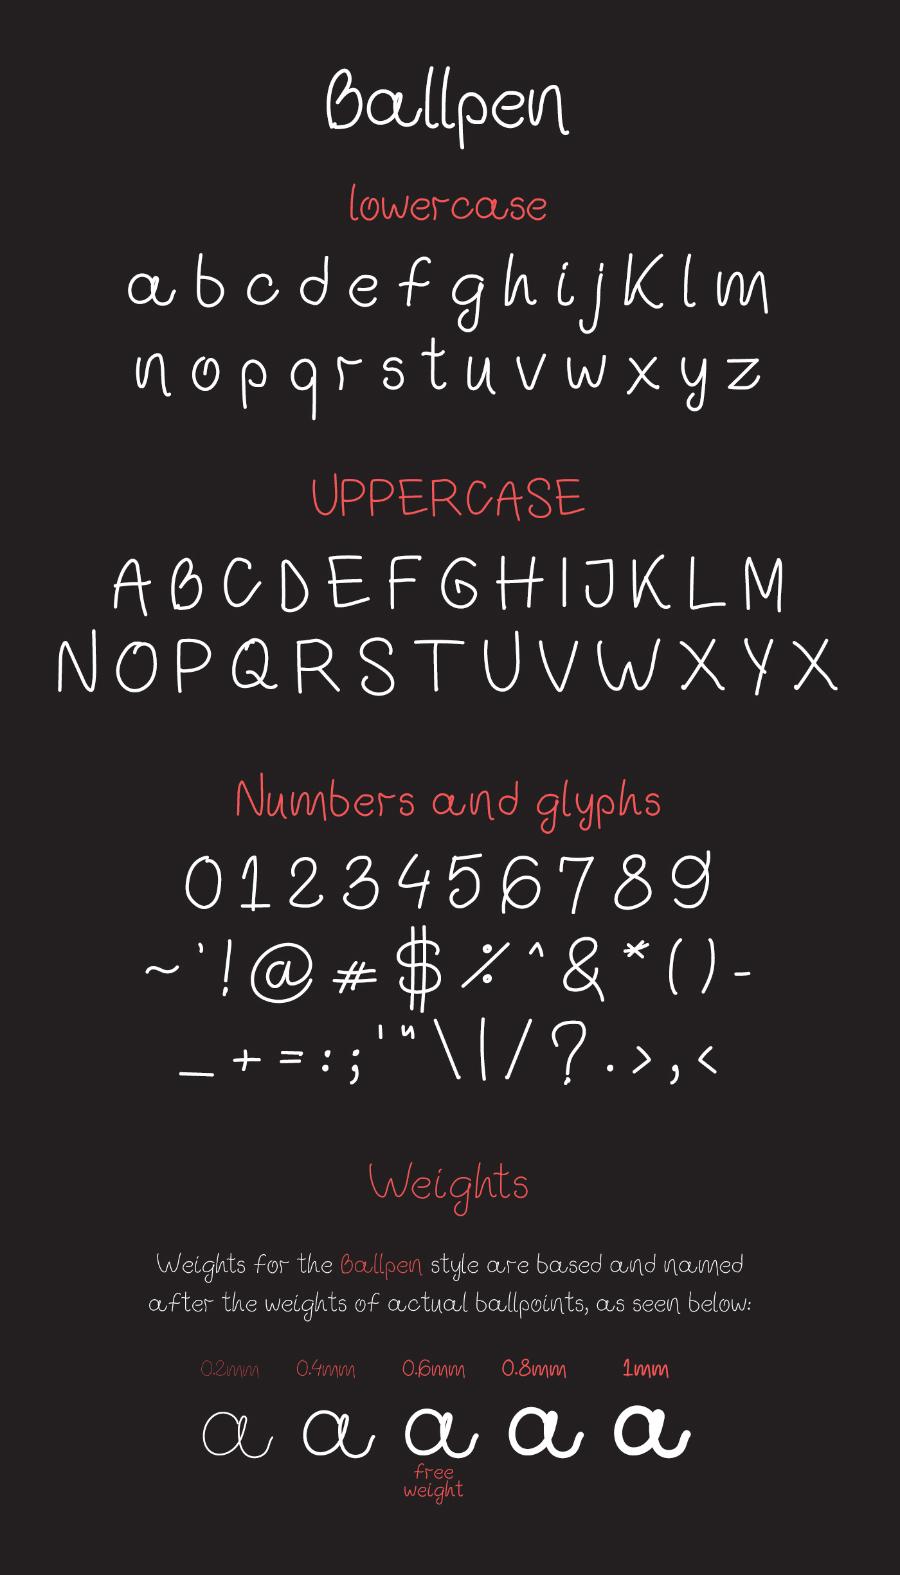 DesignALot_Ballpen-And-Chalk-typeface_140717_prev02